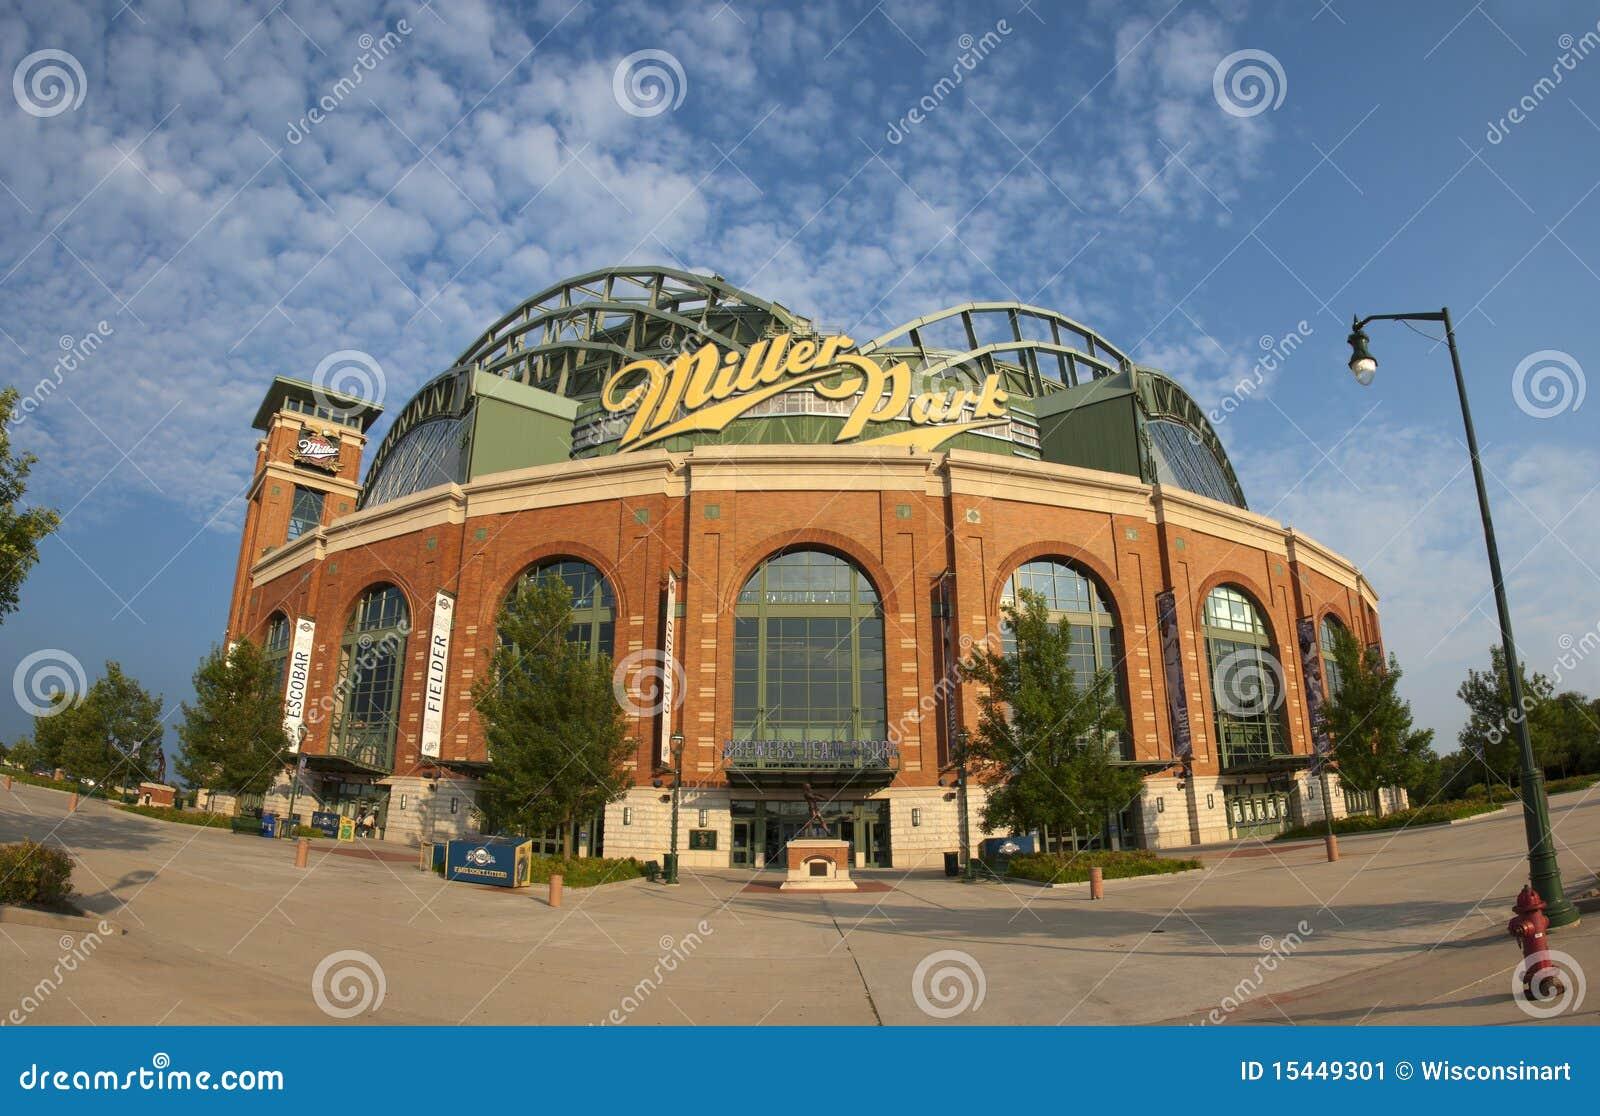 Milwaukee Brewers Bedroom In A Box Major League Baseball: Miller Park Milwaukee Brewers MLB Baseball Editorial Photo